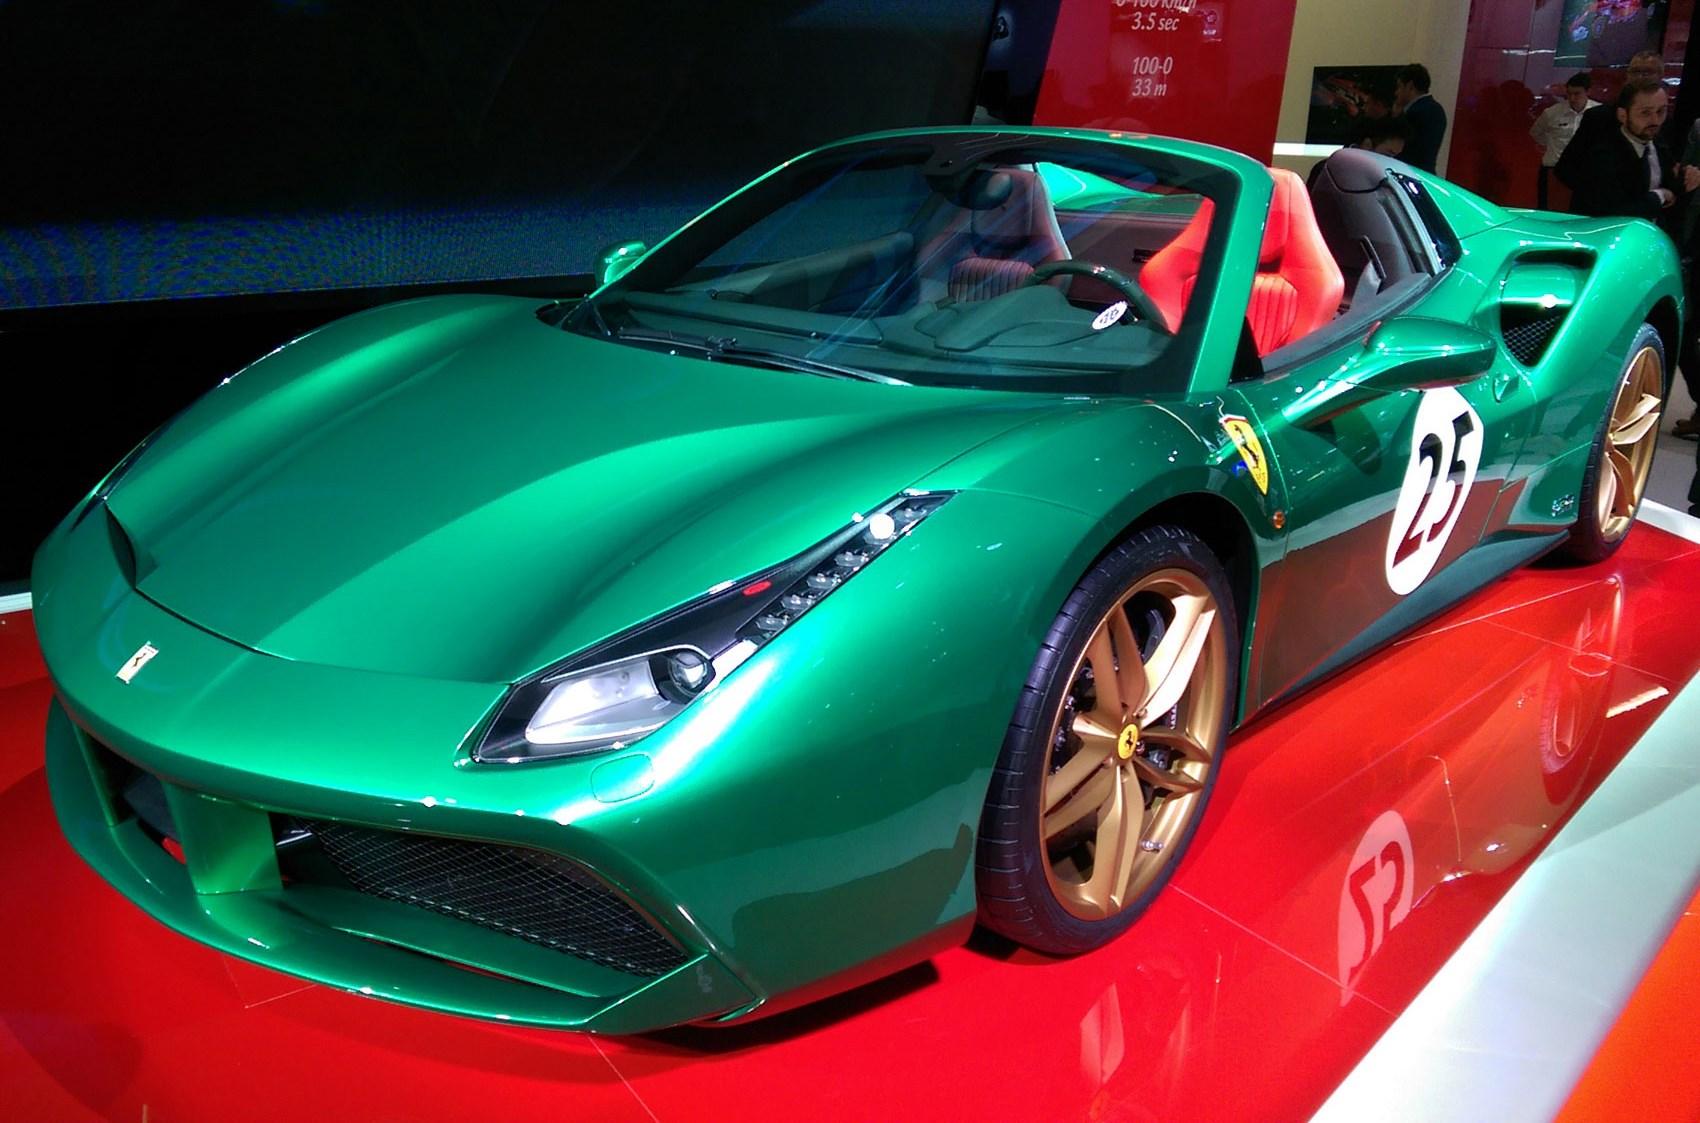 Laferrari For Sale >> Ferrari launches 70-year anniversary models at Paris 2016 | CAR Magazine